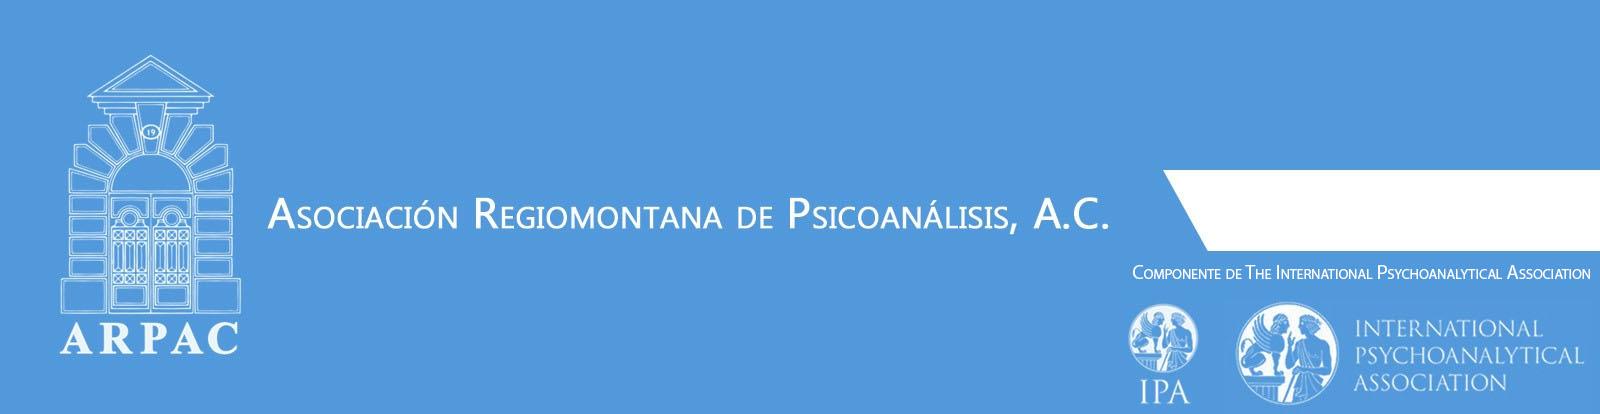 Asociación Regiomontana de Psicoanálisis A.C.